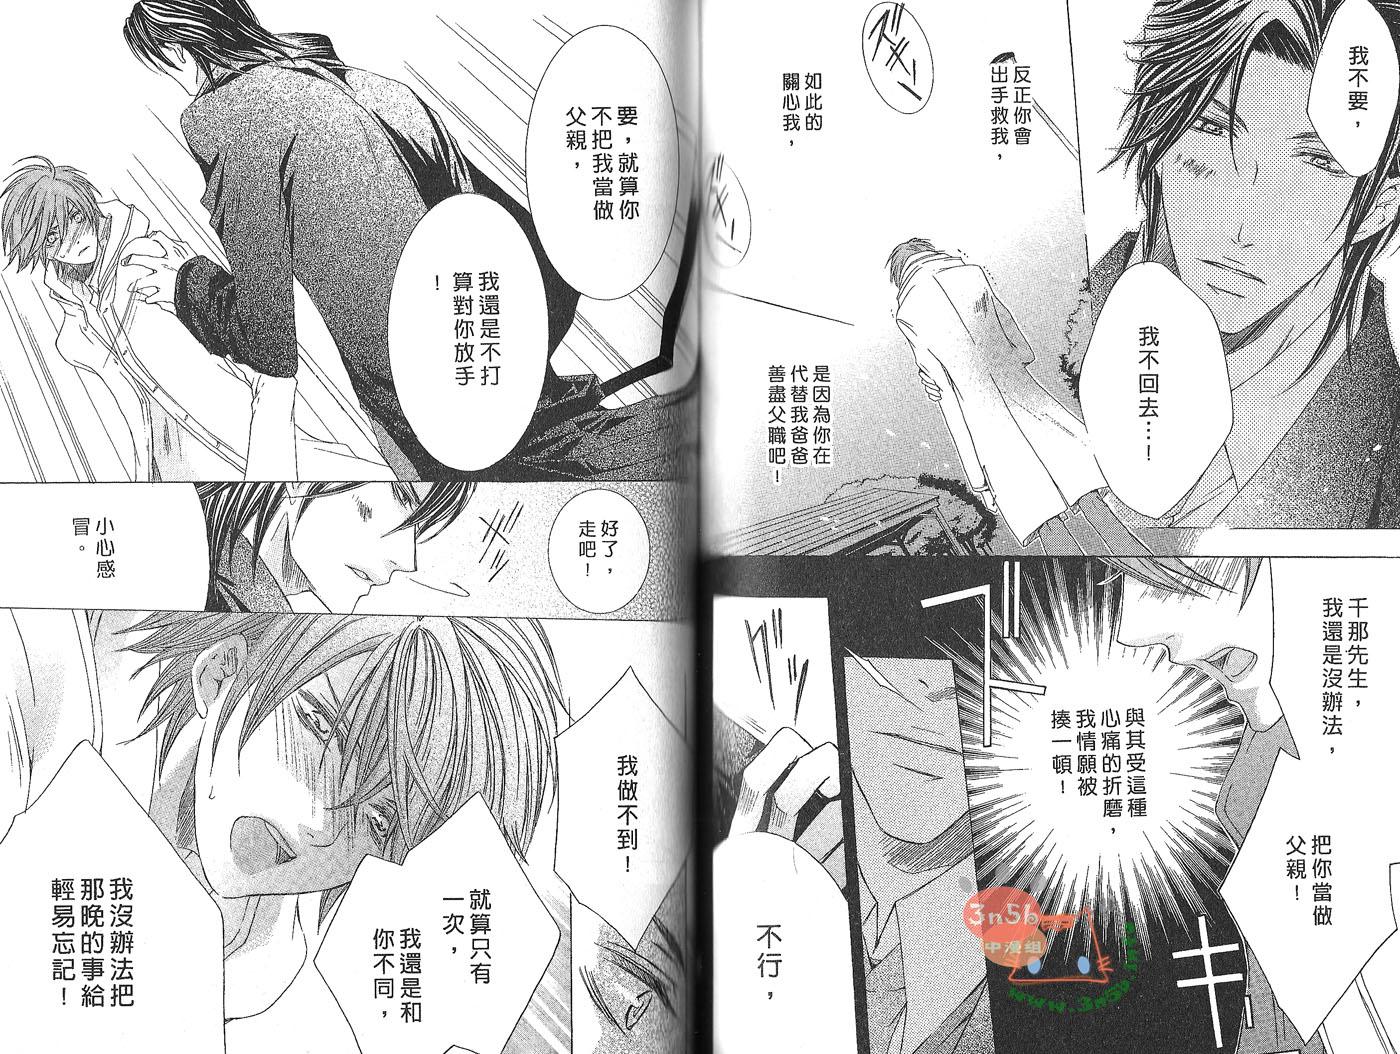 Zero Yaoi: Monster Master Manga Yaoi Raw: zero-anime-yaoi-online.blogspot.com/2012/02/monster-master-manga...